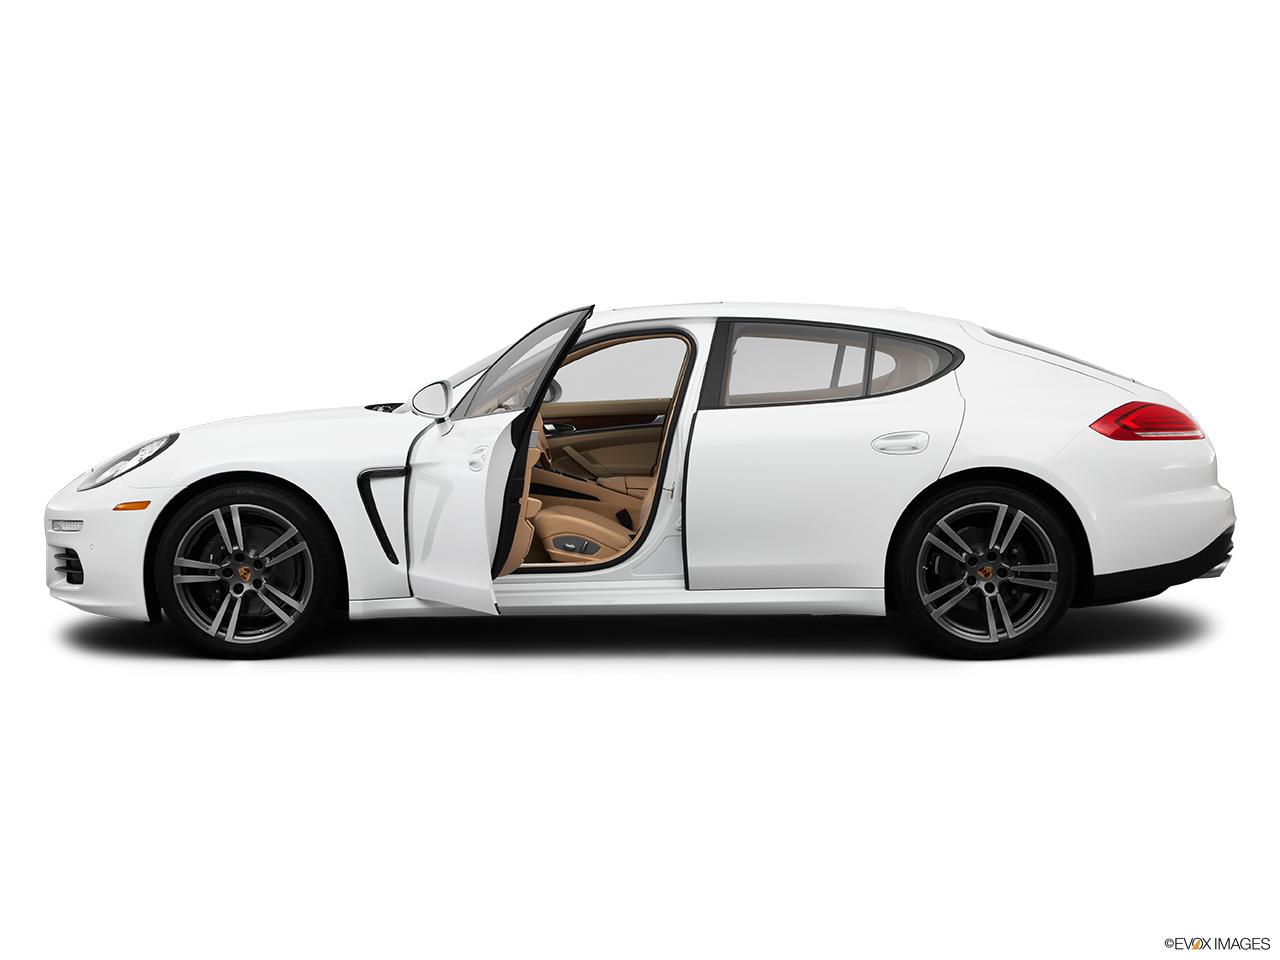 2015 porsche panamera 4 hatchback drivers side profile with drivers side door open